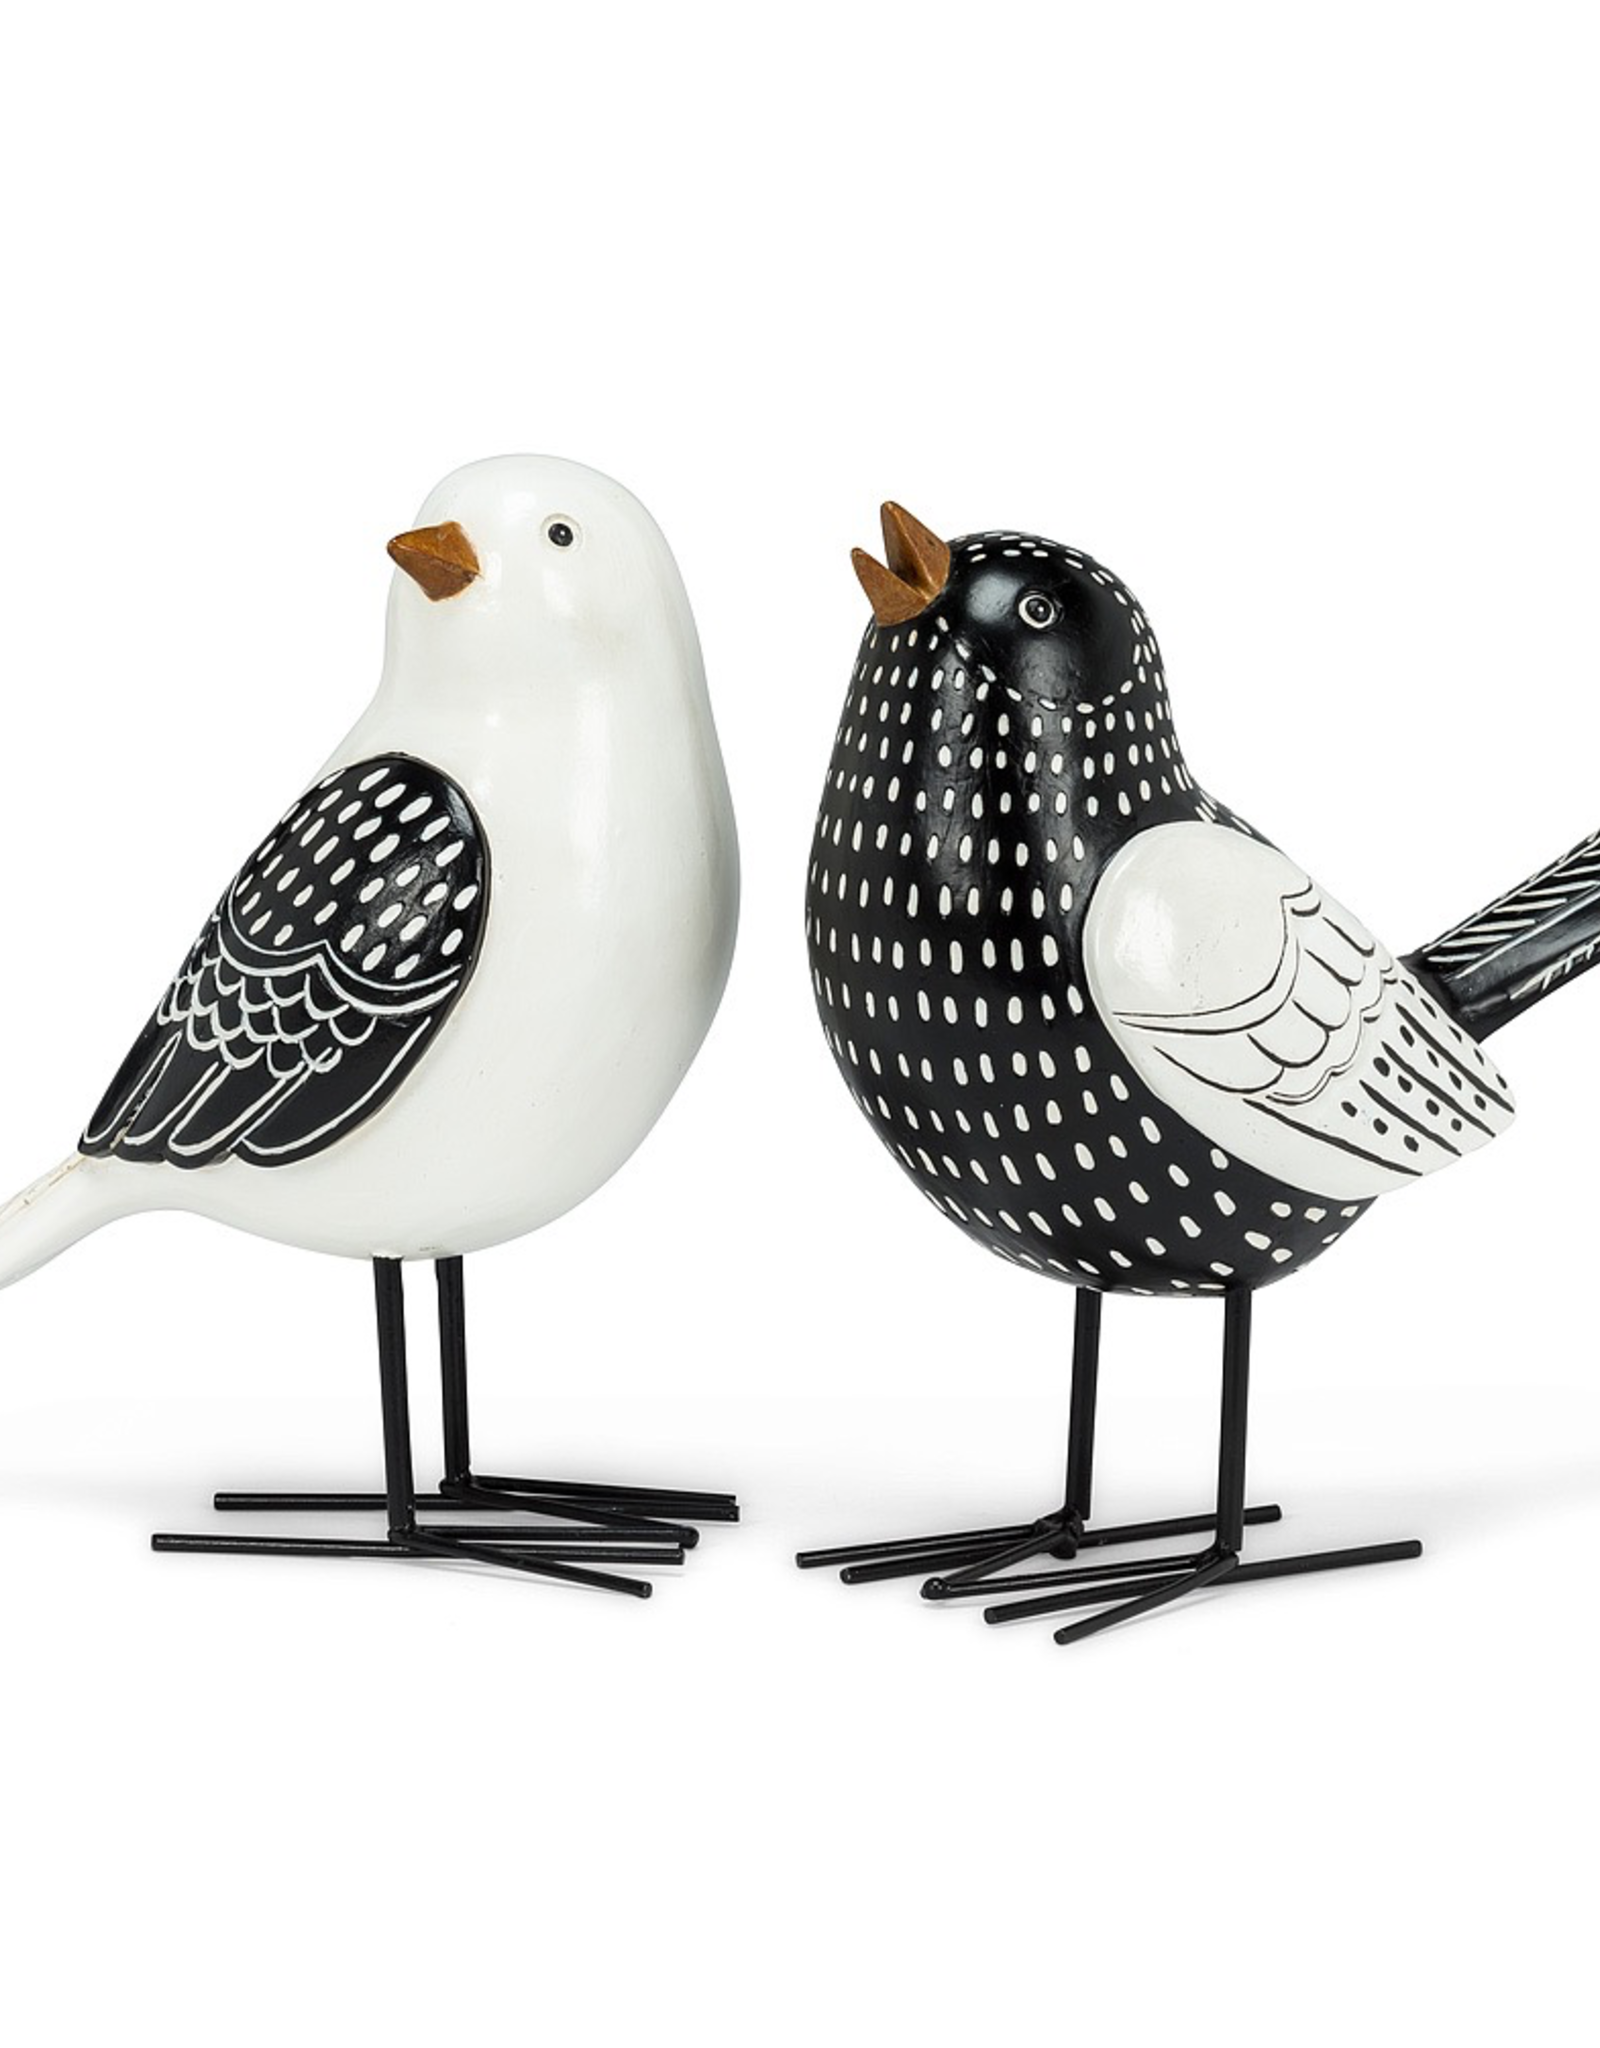 "Black and White Bird Figurine 6.5"" 2 assort."